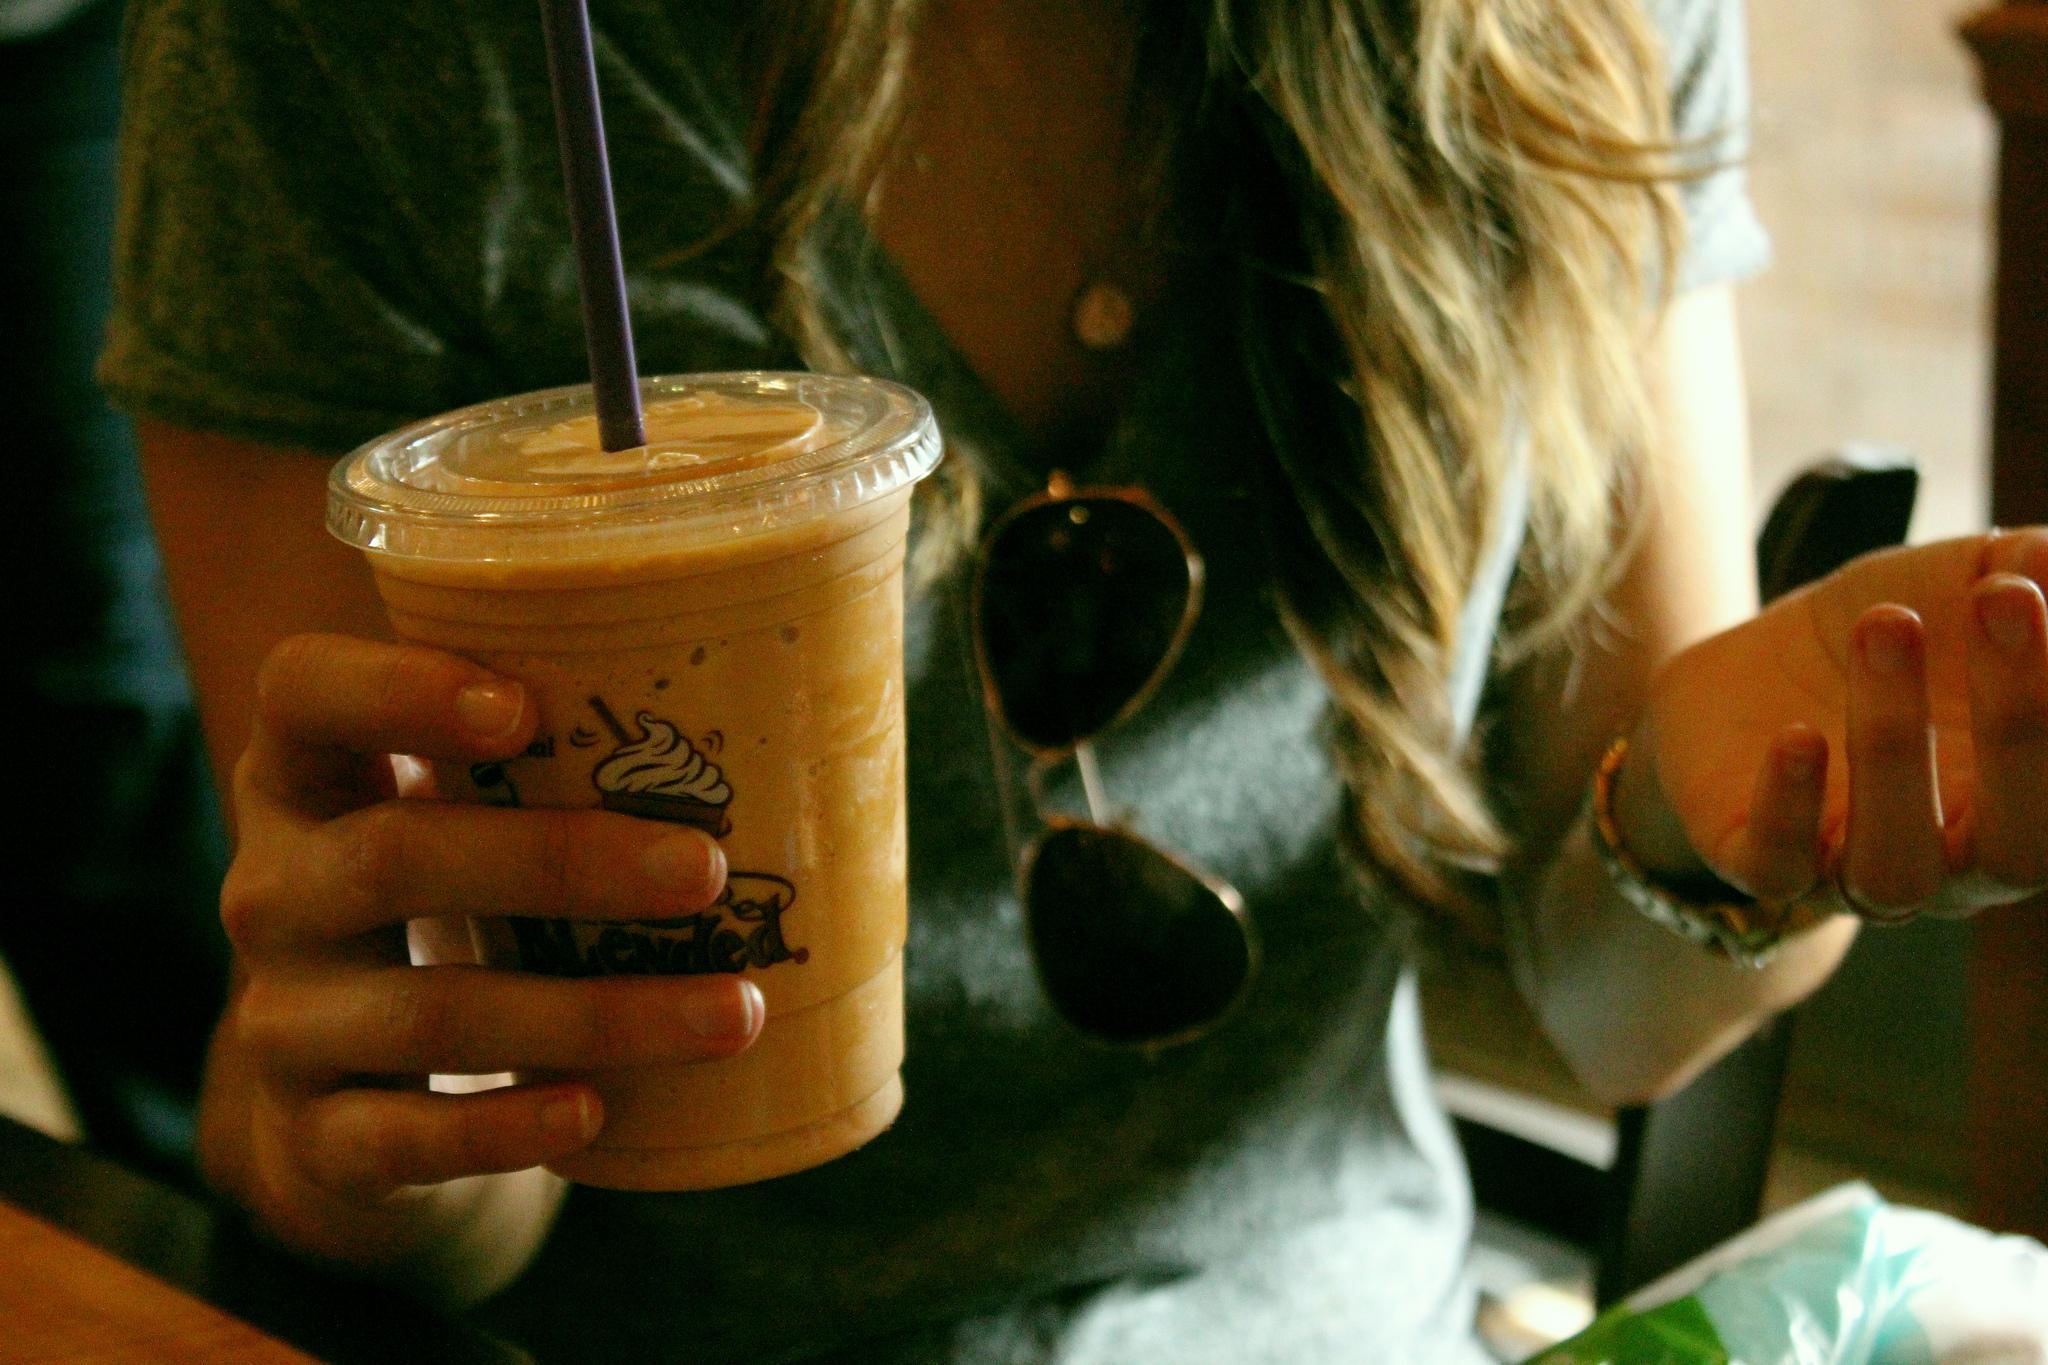 How to Make Starbucks-Style Drinks - Healthier!